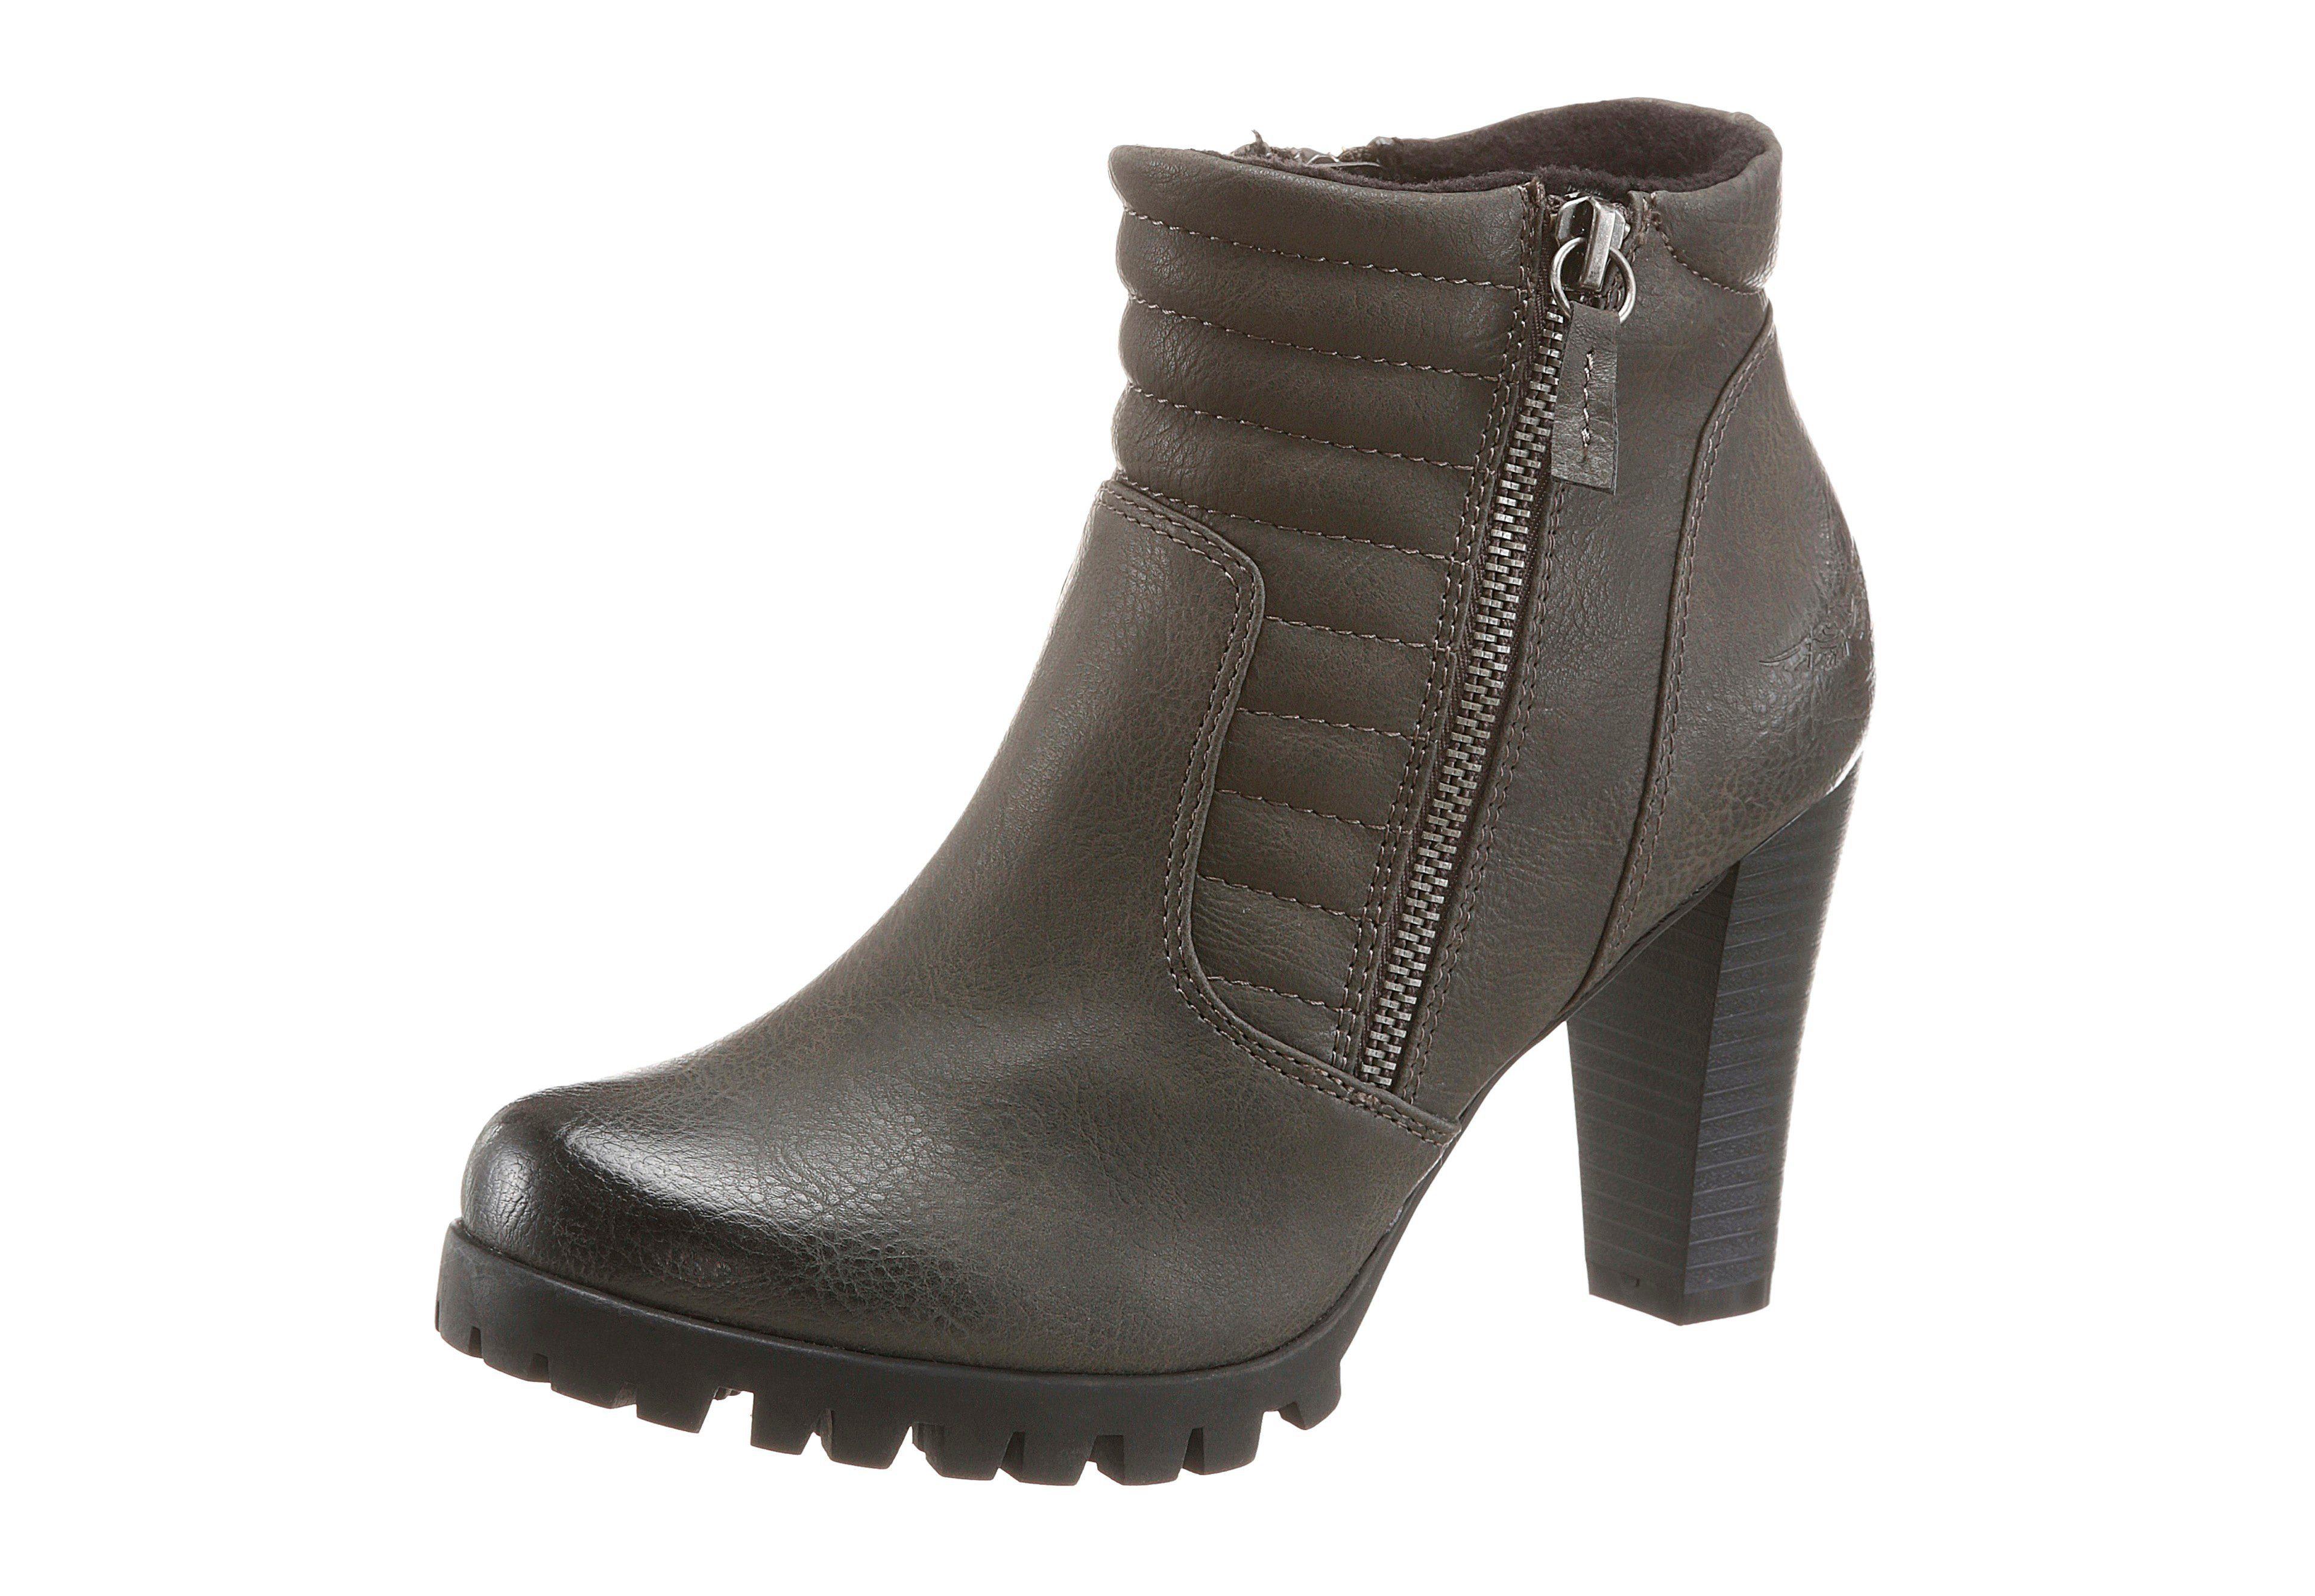 Damen Stiefelette/High Heels/Elegante Damenschuhe/Halbhohe Stiefel/Blockabsatz/Khaki/Braun, EU 40